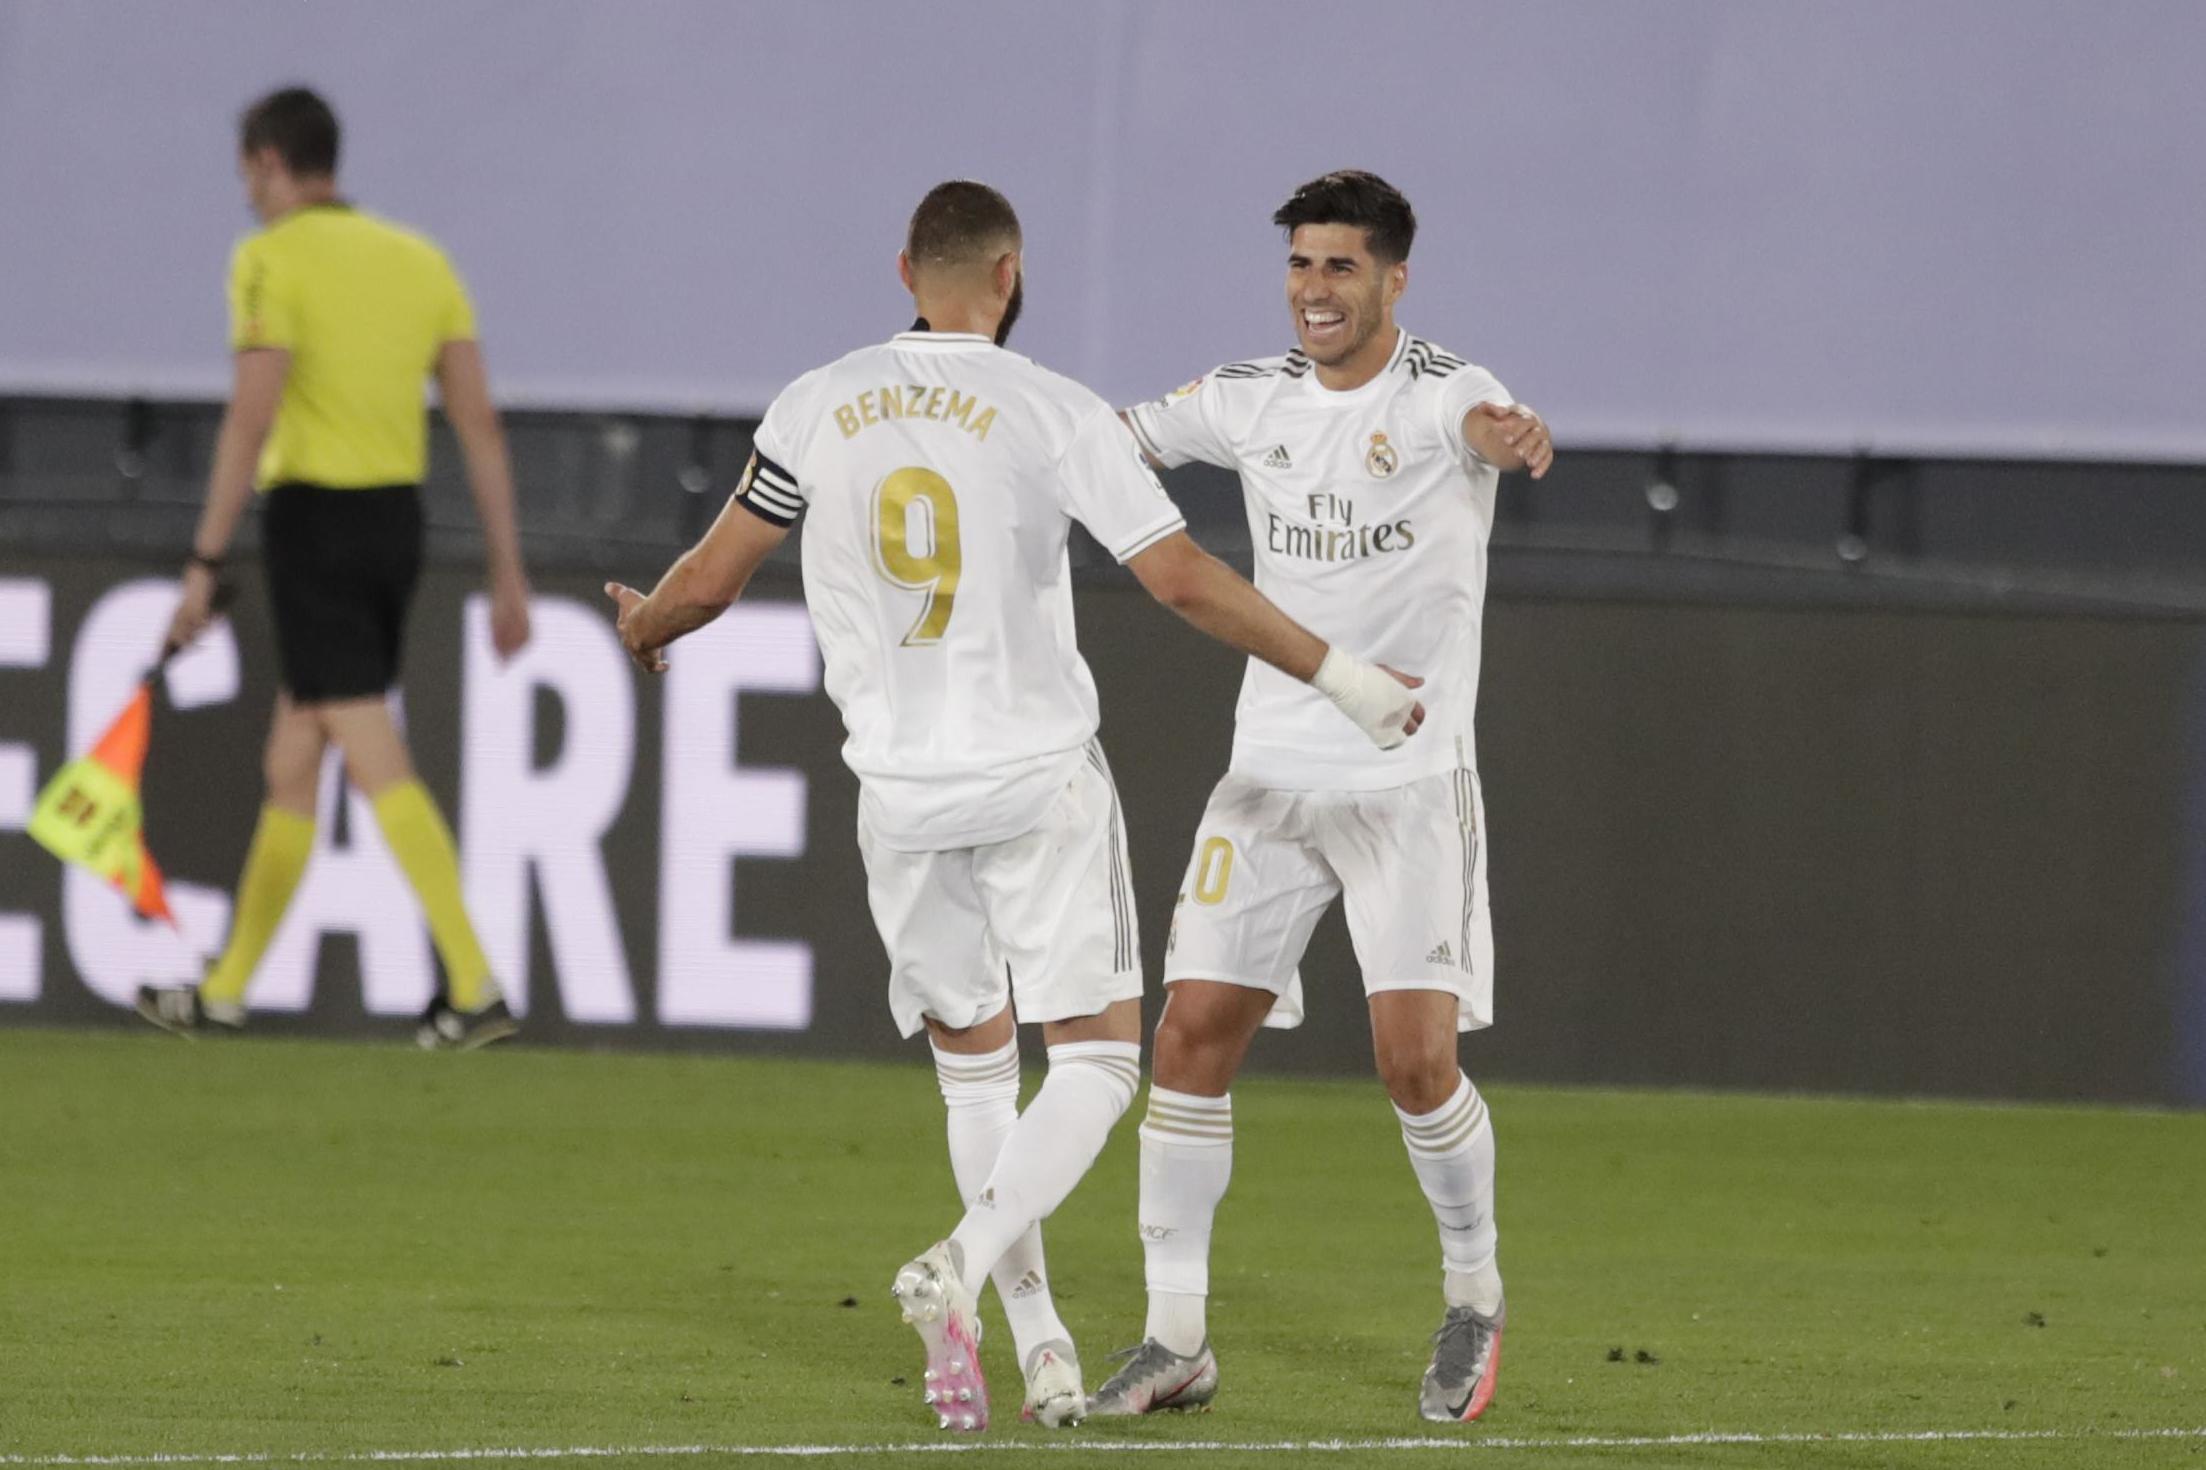 Real Madrid 2-0 Alaves result: Karim Benzema shines as Los Blancos edge closer to LaLiga title